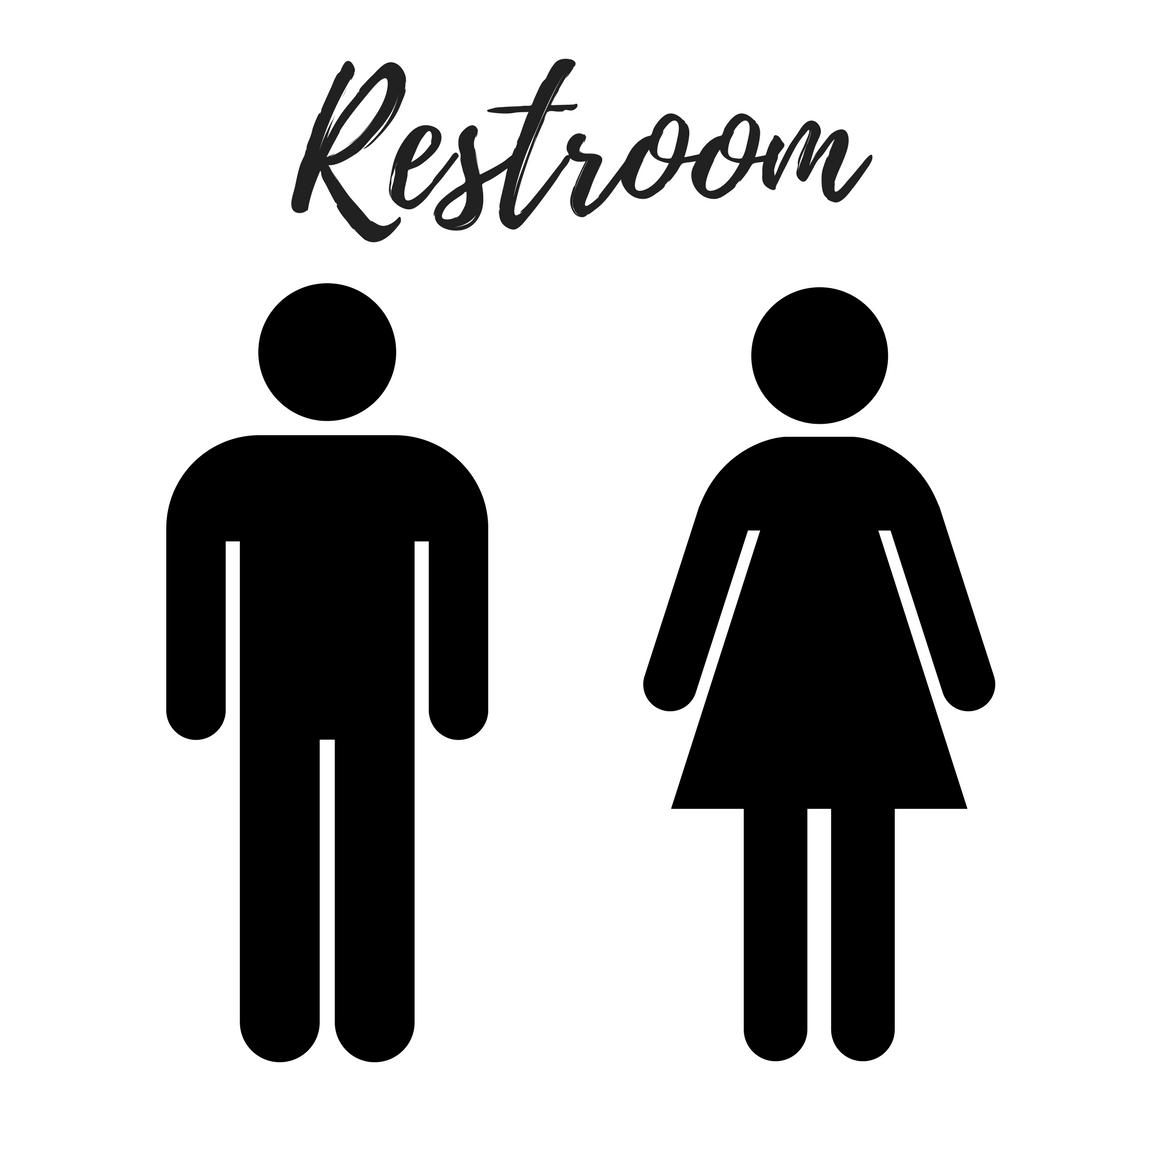 10 Free Bathroom Printables For Any Bathroom Any Decor And It S Free Bathroom Printables Free Bathroom Printables Printable Bathroom Signs